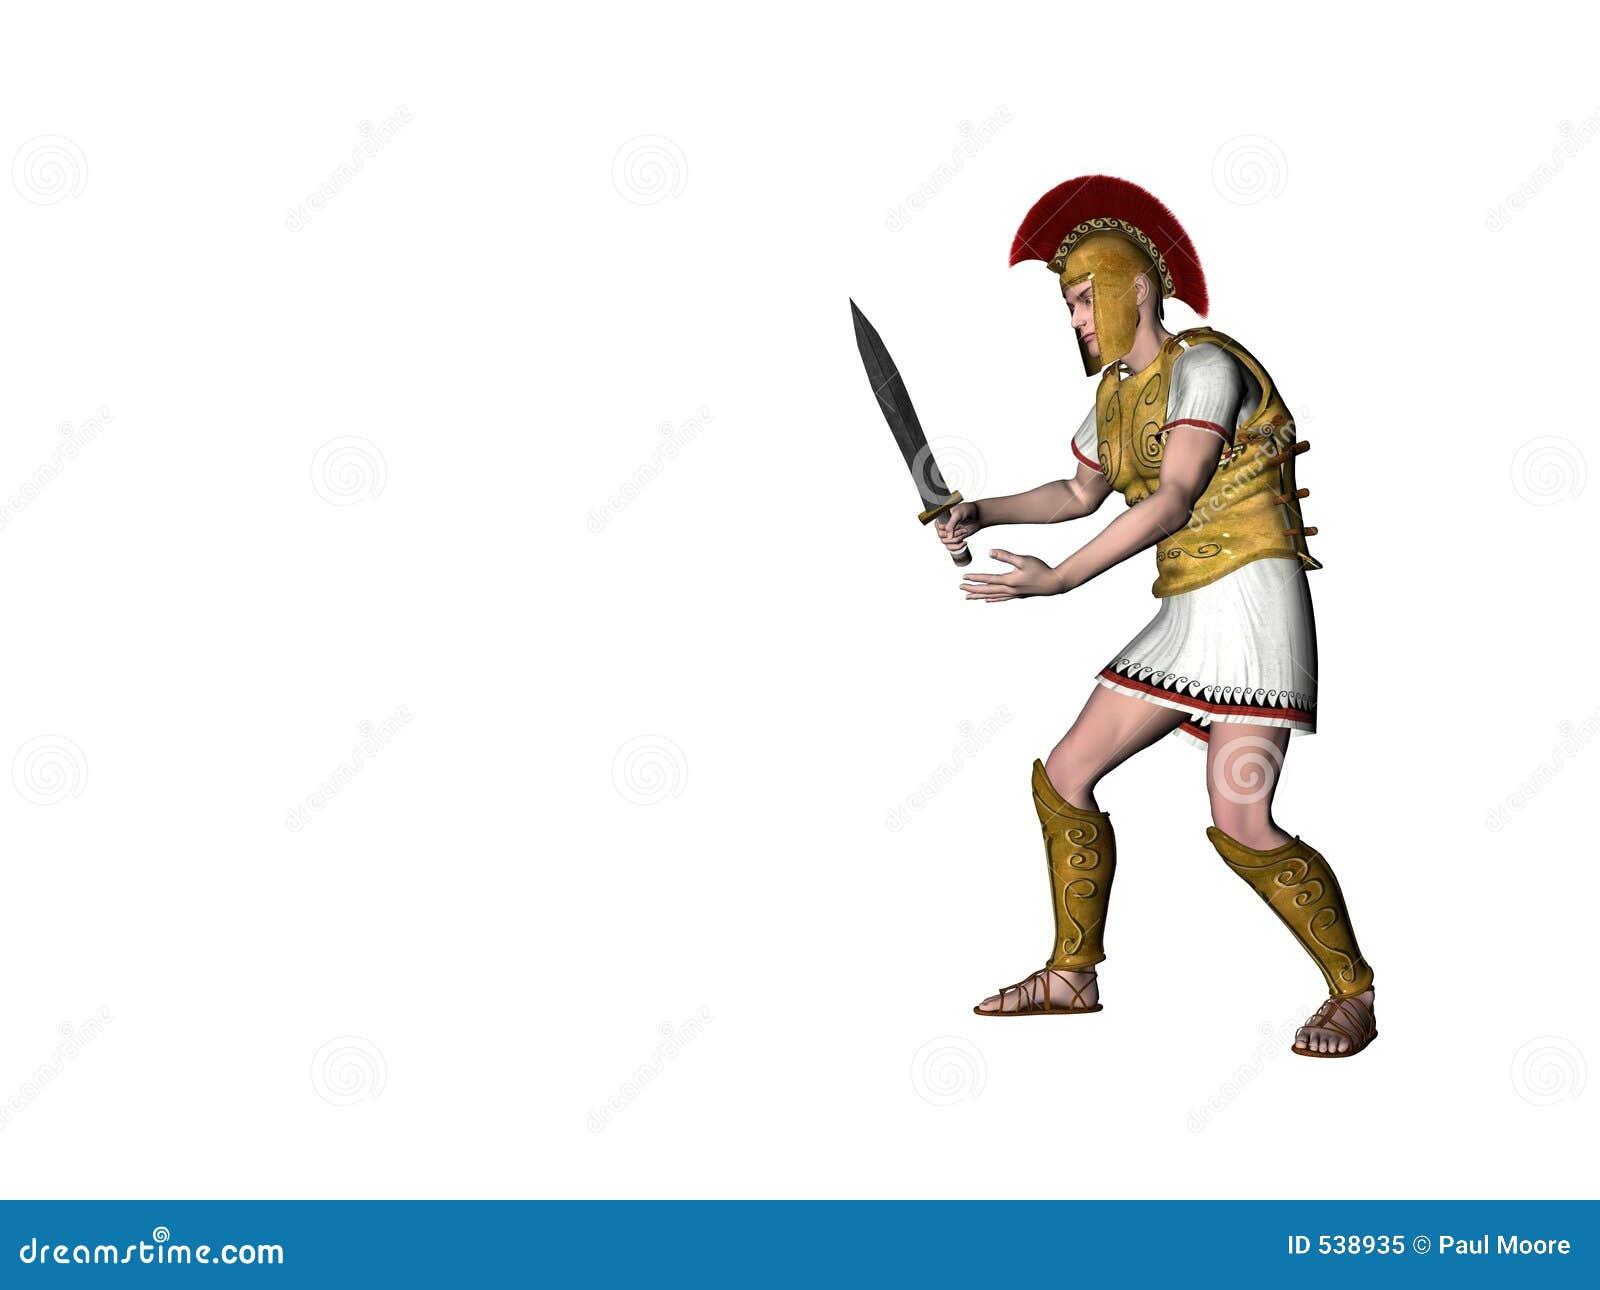 Download 6希腊战士 库存例证. 插画 包括有 回报, 坚不可摧, 翻译, 战争, 盖子, 欧洲, 纹章, 伪造, 战士 - 538935